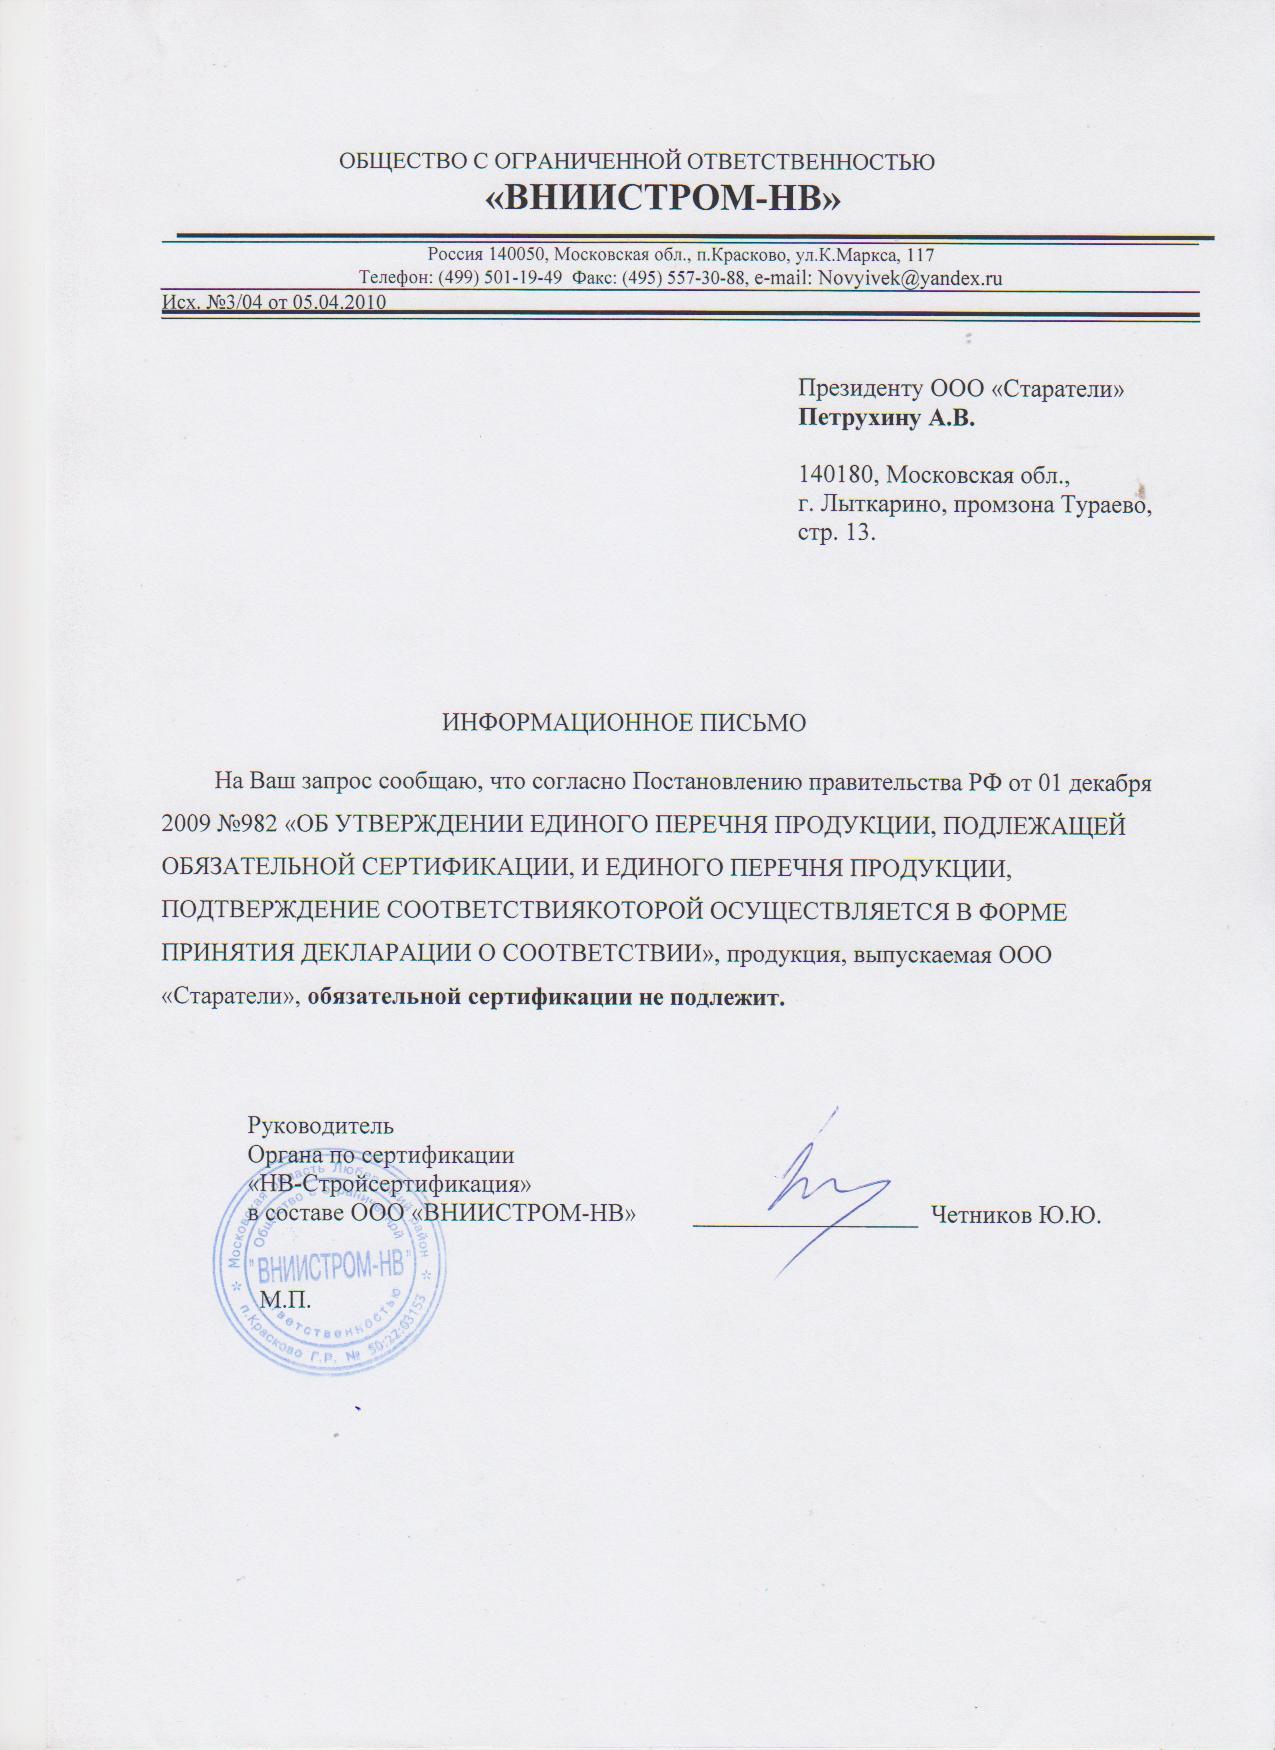 Грунтовка бетоноконтакт старатели сертификат соответствия бетоноконтакт применение hfc[jl